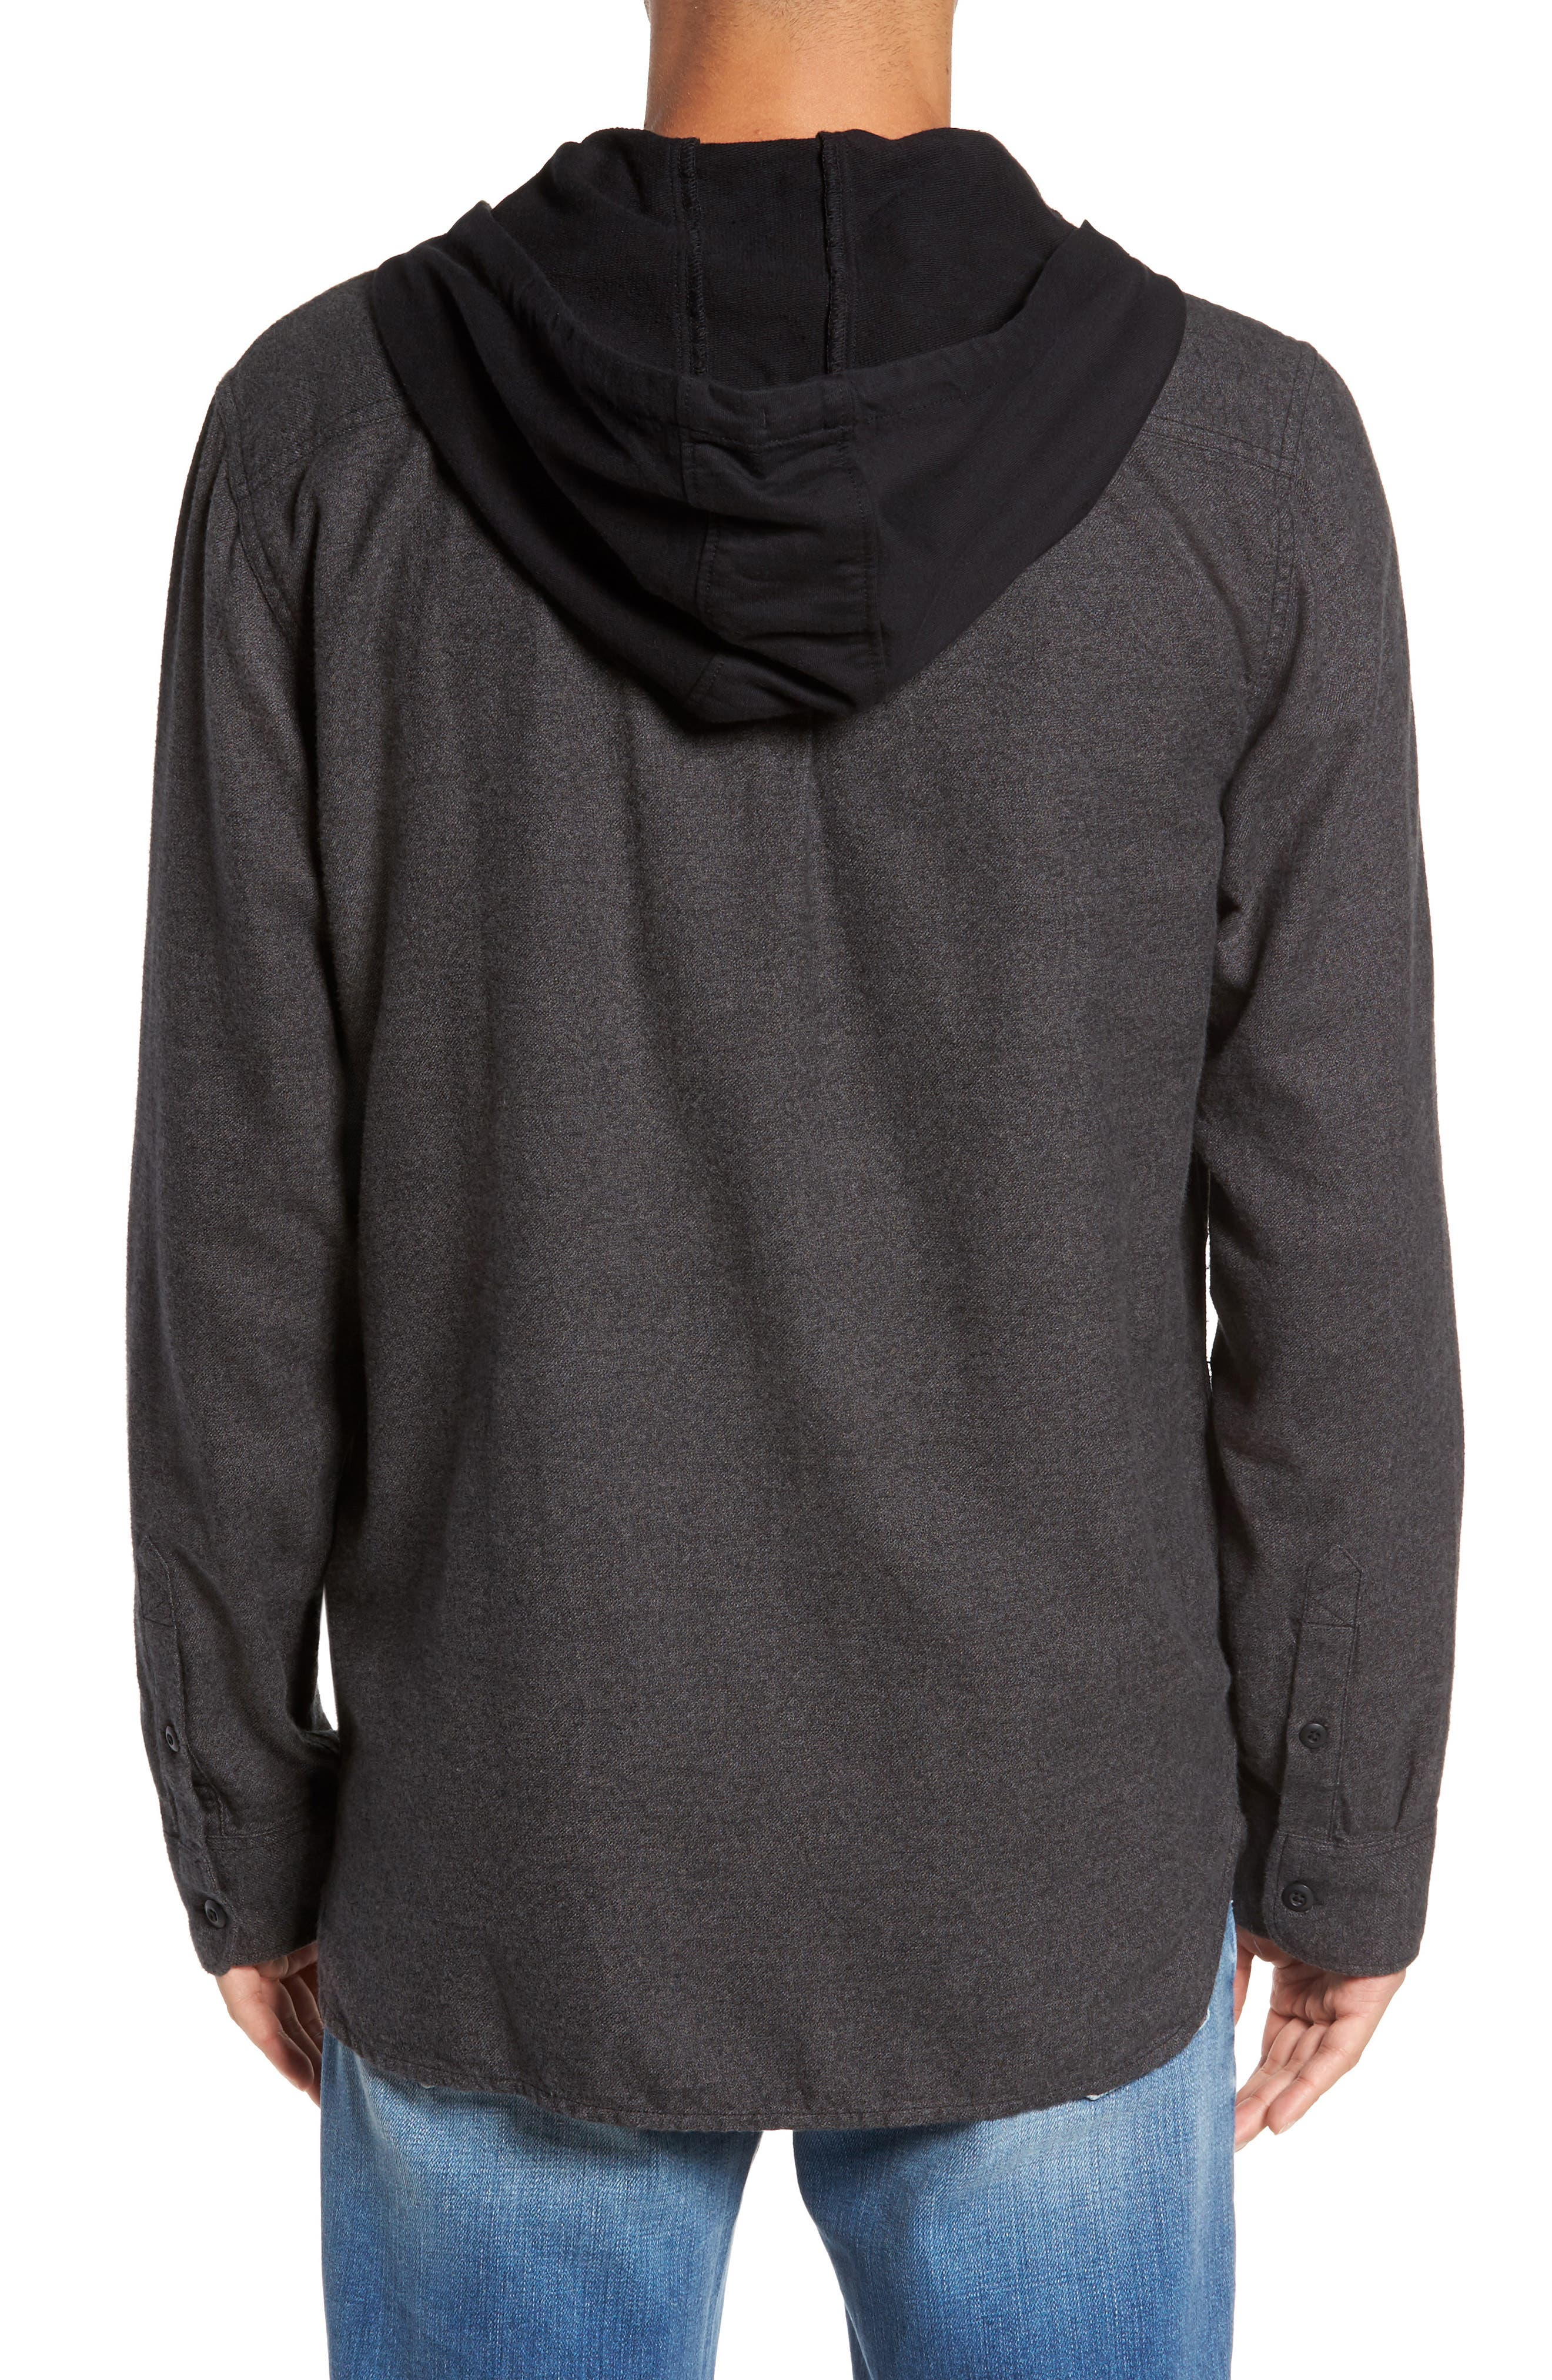 Never Mind Hooded Zip Shirt Jacket,                             Alternate thumbnail 2, color,                             001